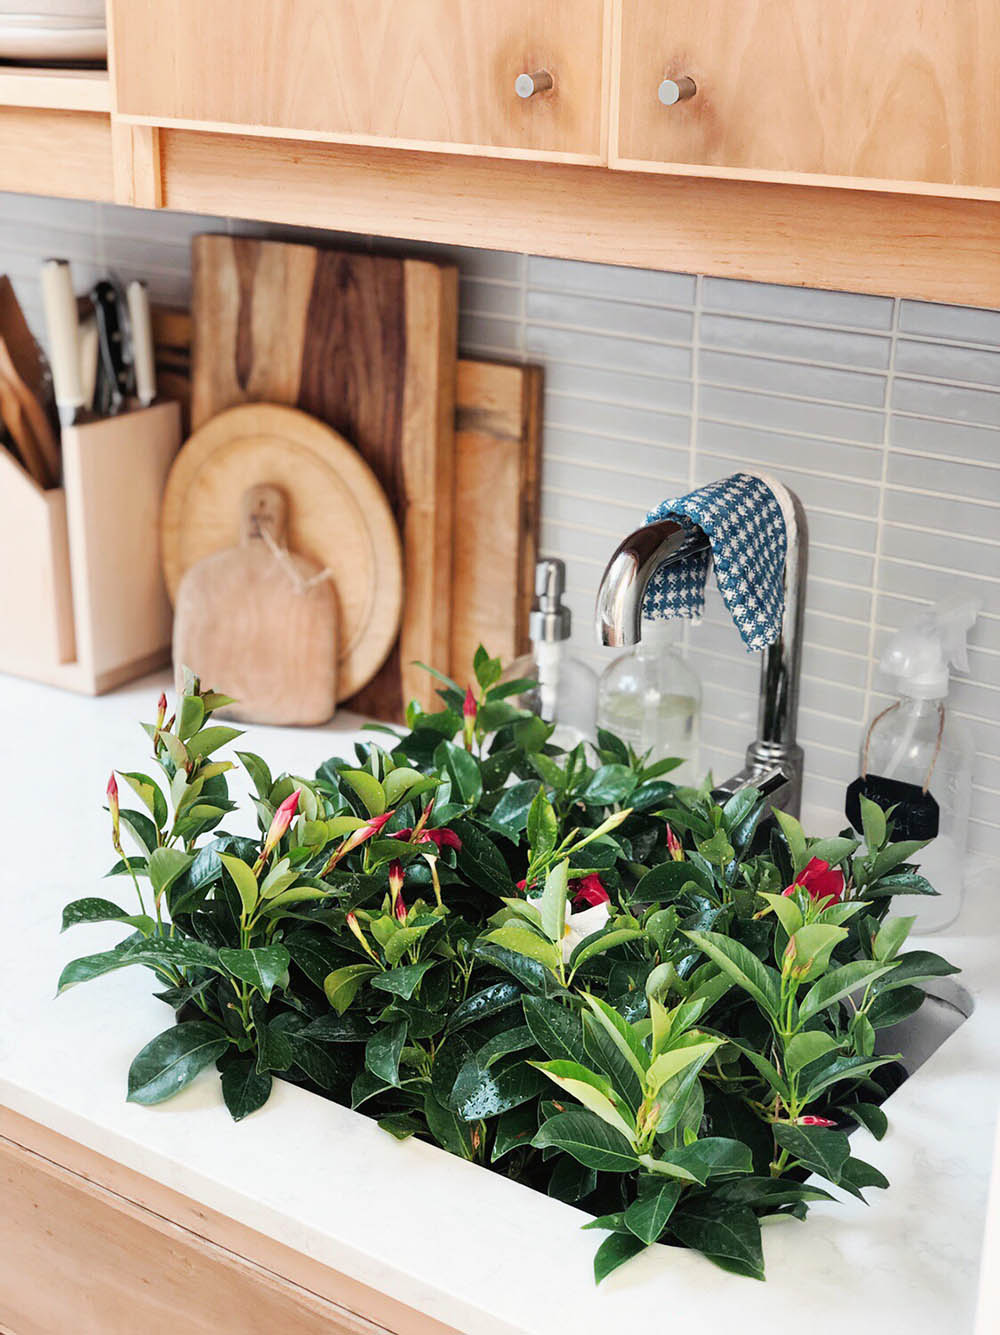 smallspace_kitchen_plants.jpg